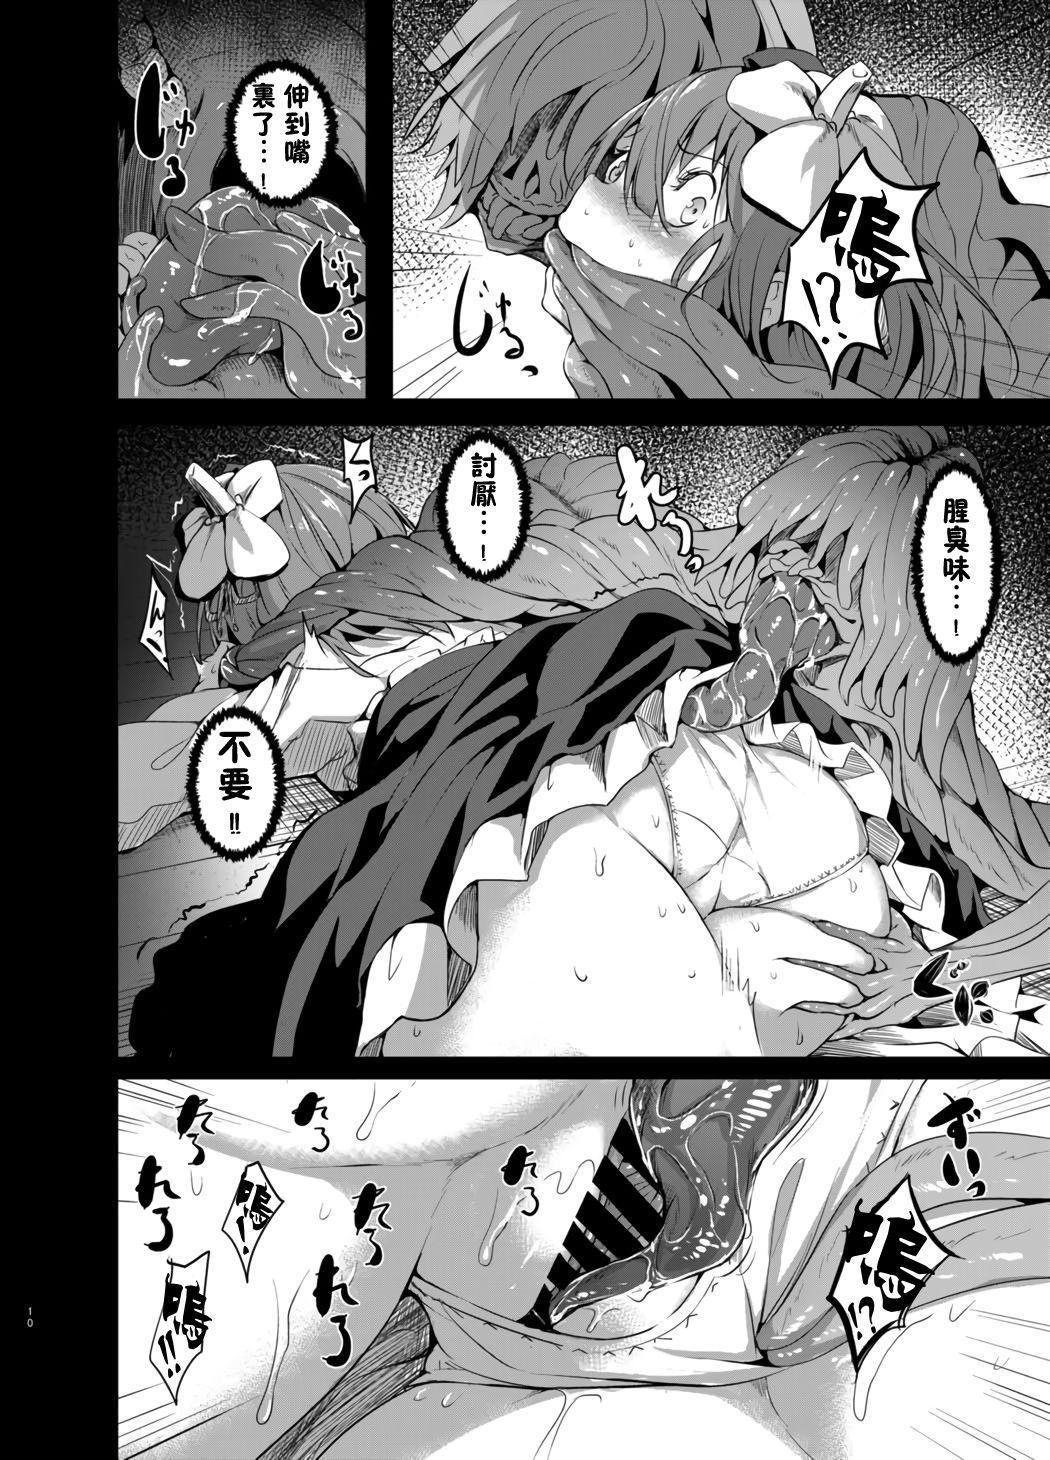 Gensou Kijuu Kuukan Go 7